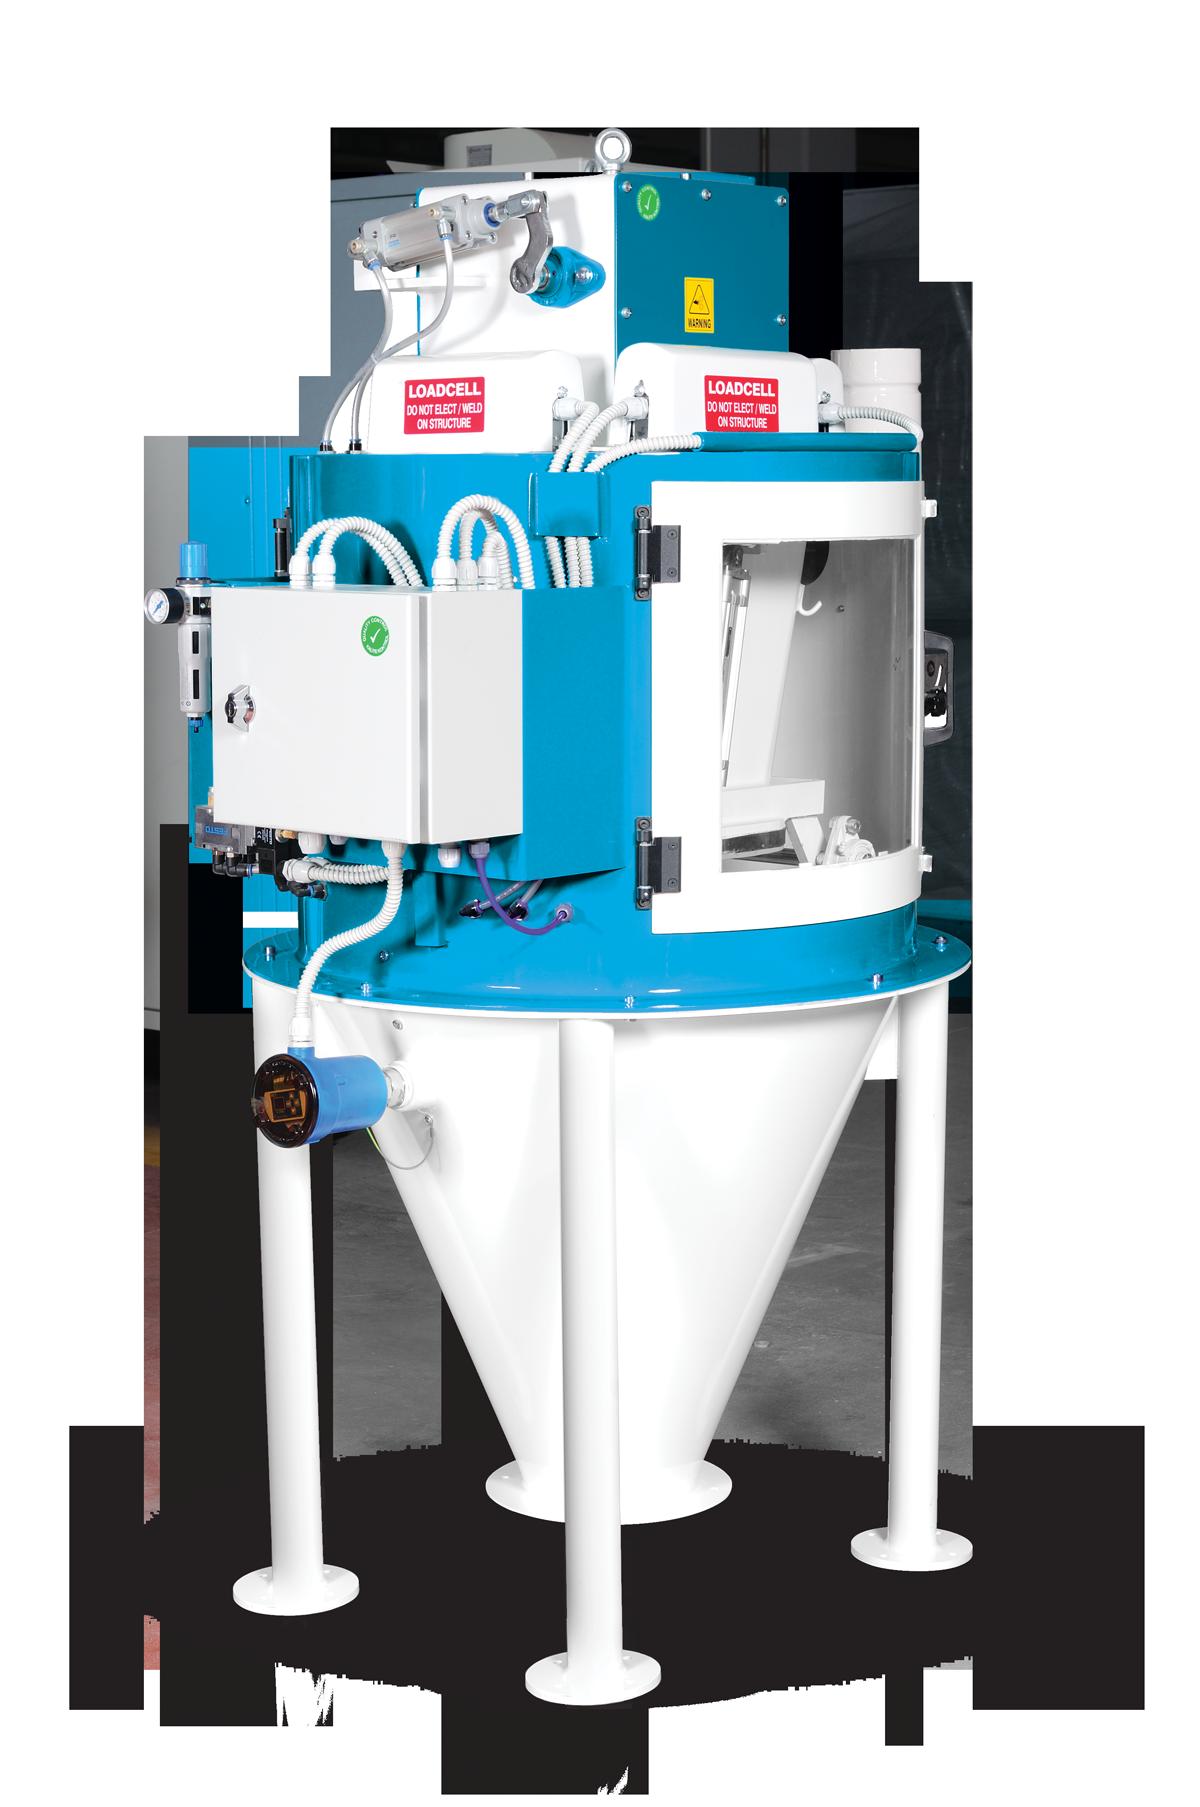 Müstakil PLC Kontrollü Randıman Kantarları – Tubex Tip 40/80/120 Lt.2